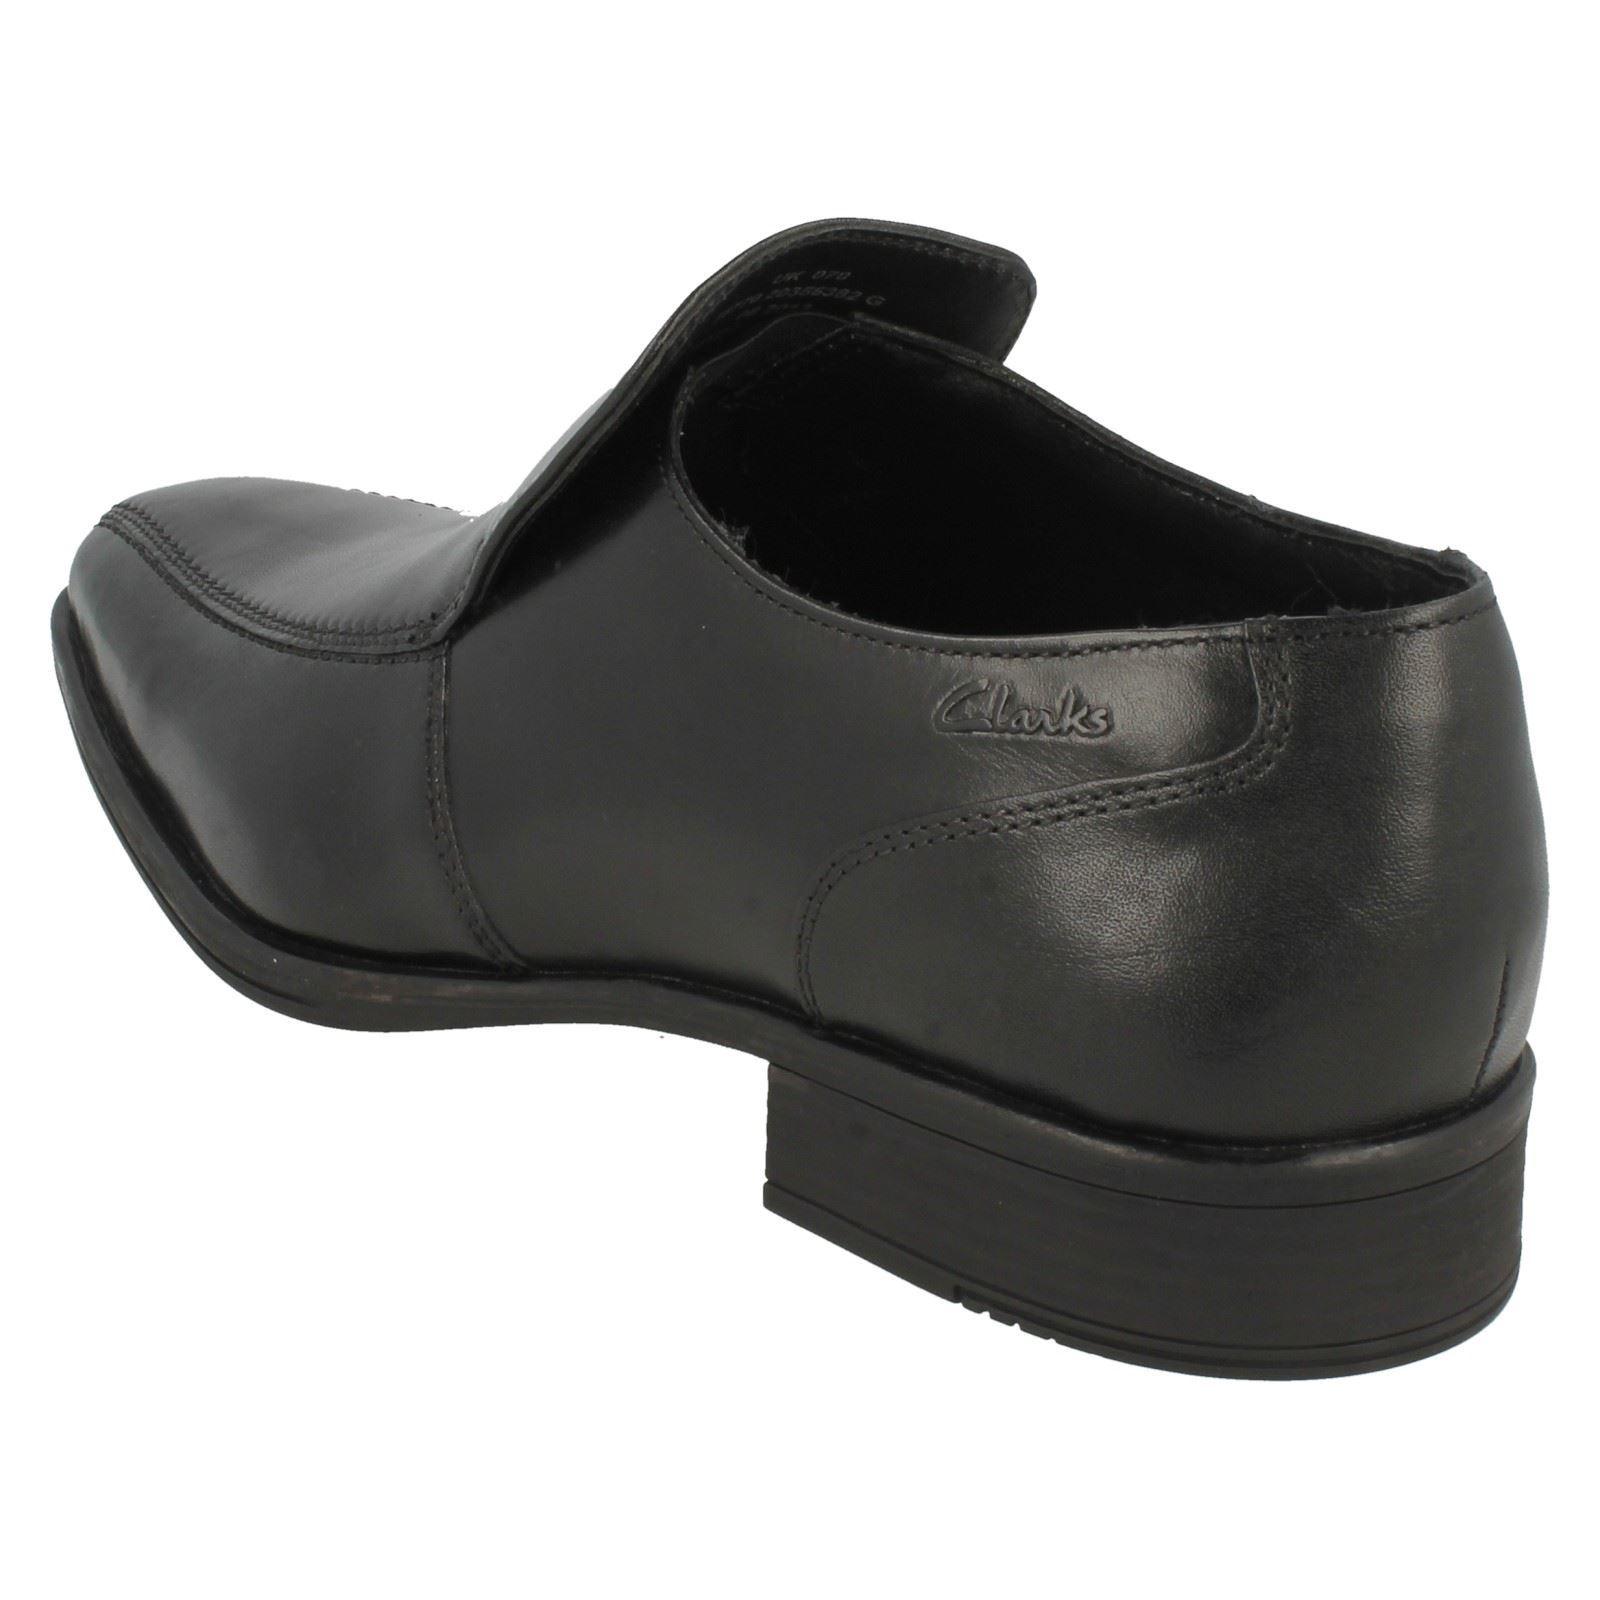 Mens Clarks Formal Slip On Shoes Style - Flenk Step